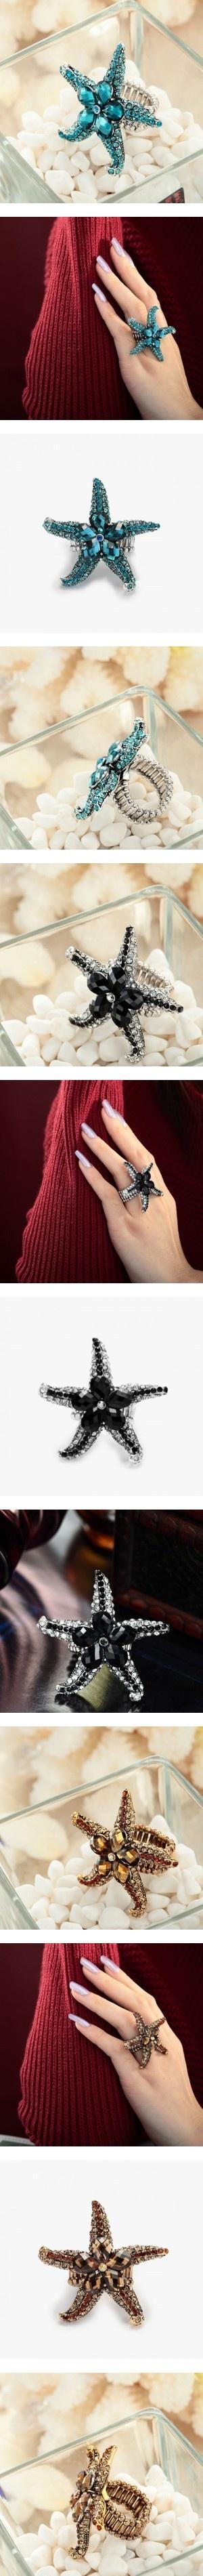 """Starfish ring"" by ki-yu ❤ liked on Polyvore"